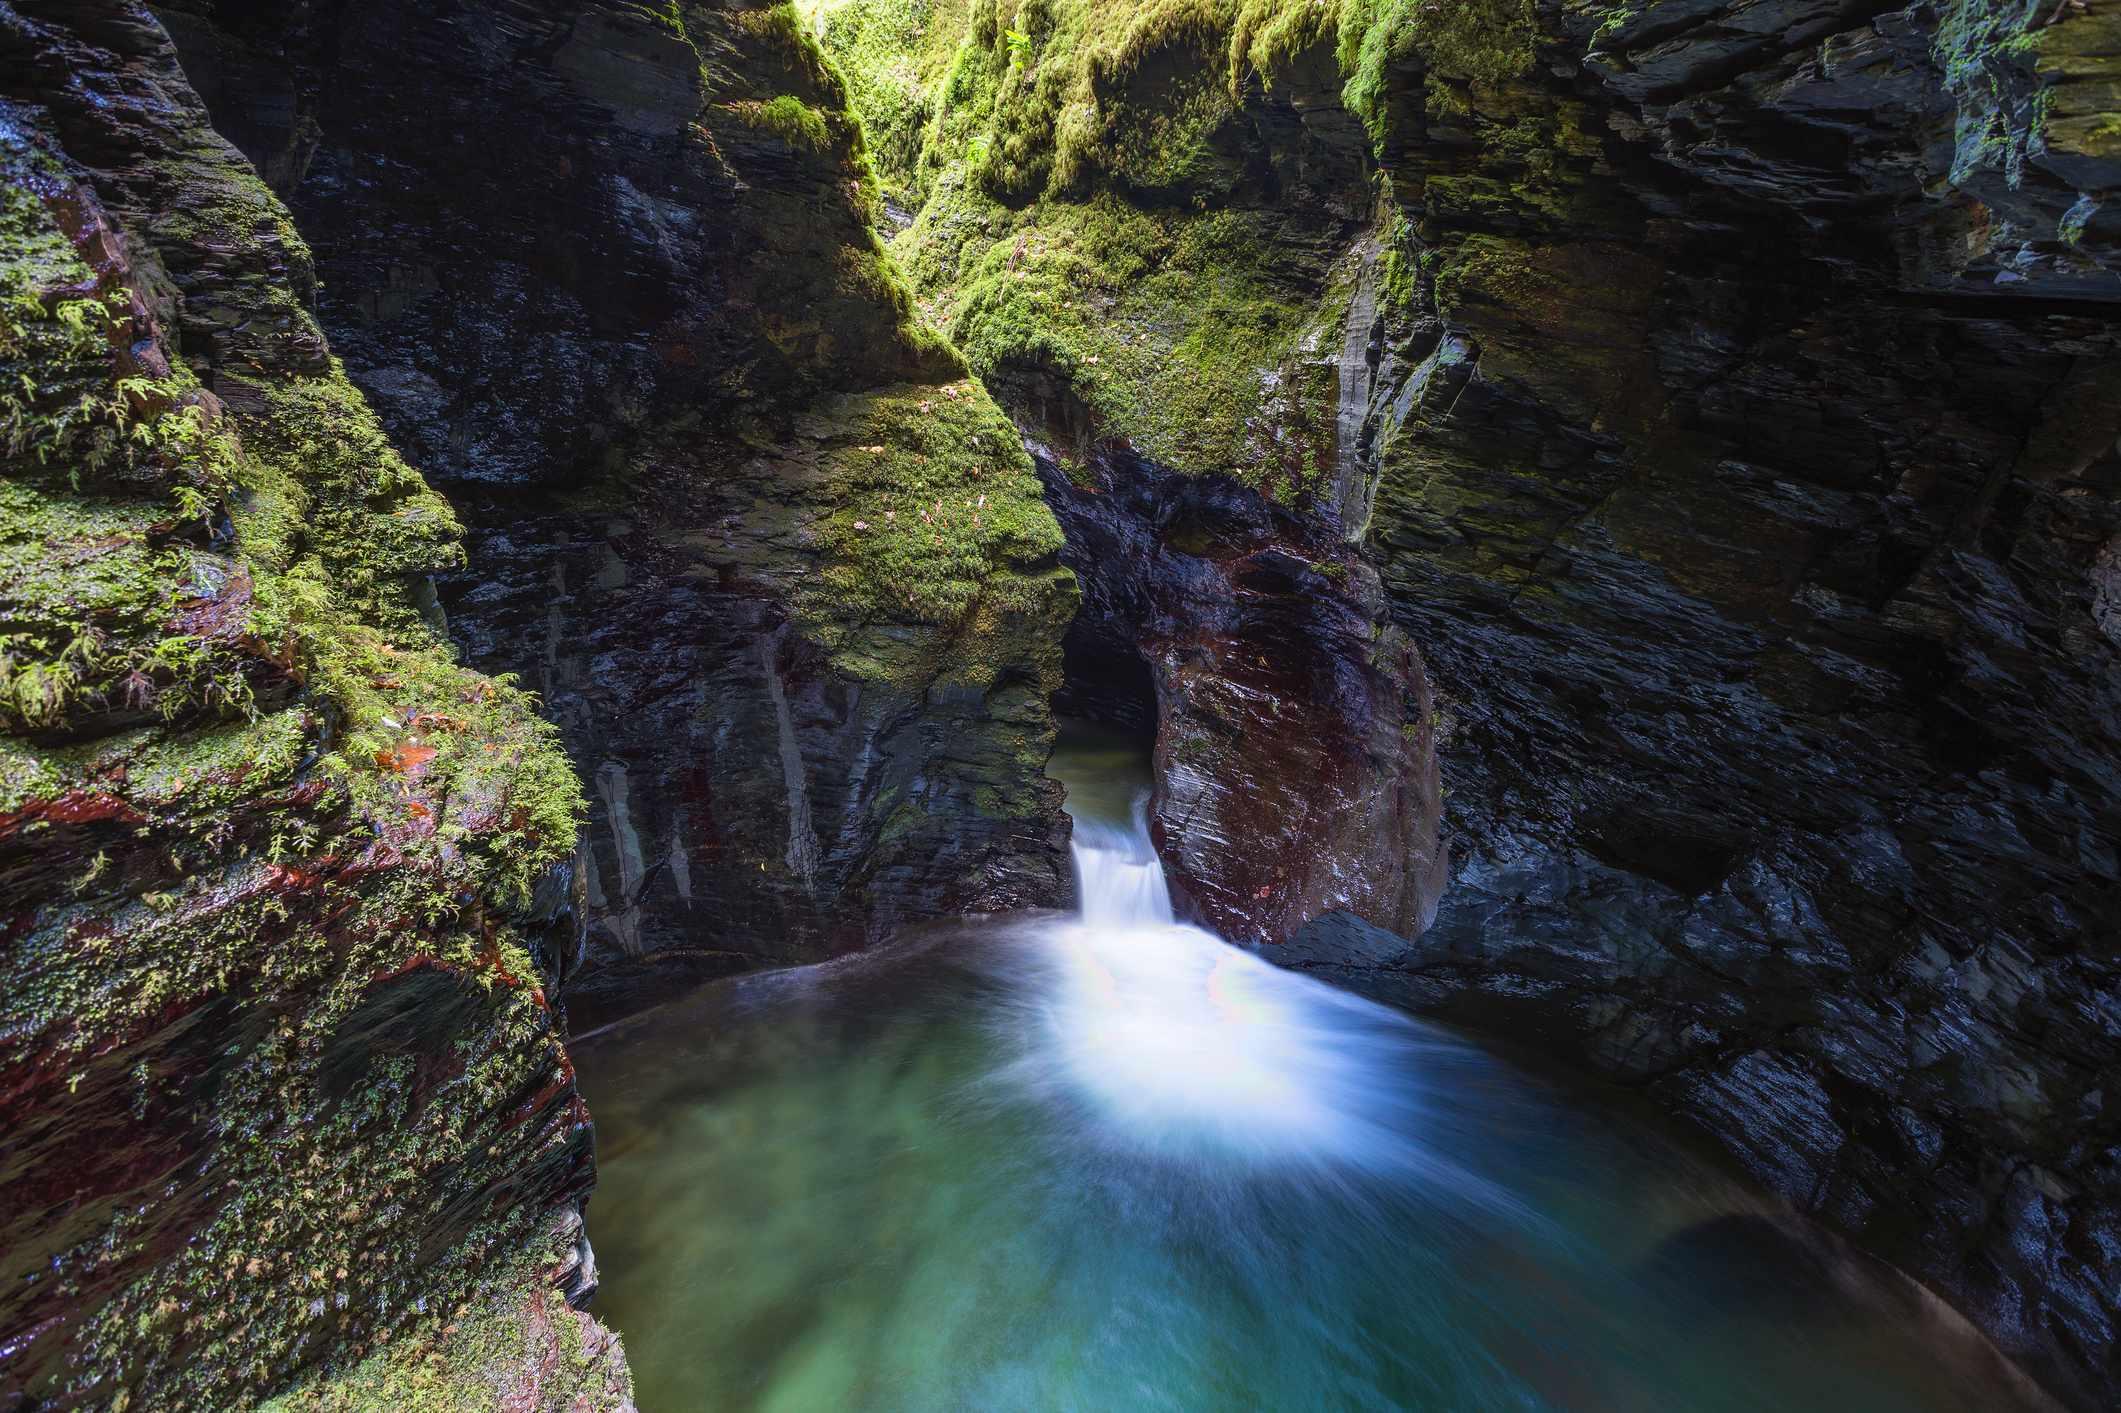 Devils Cauldron in Lydford Gorge, near Tavistock, Devon, UK